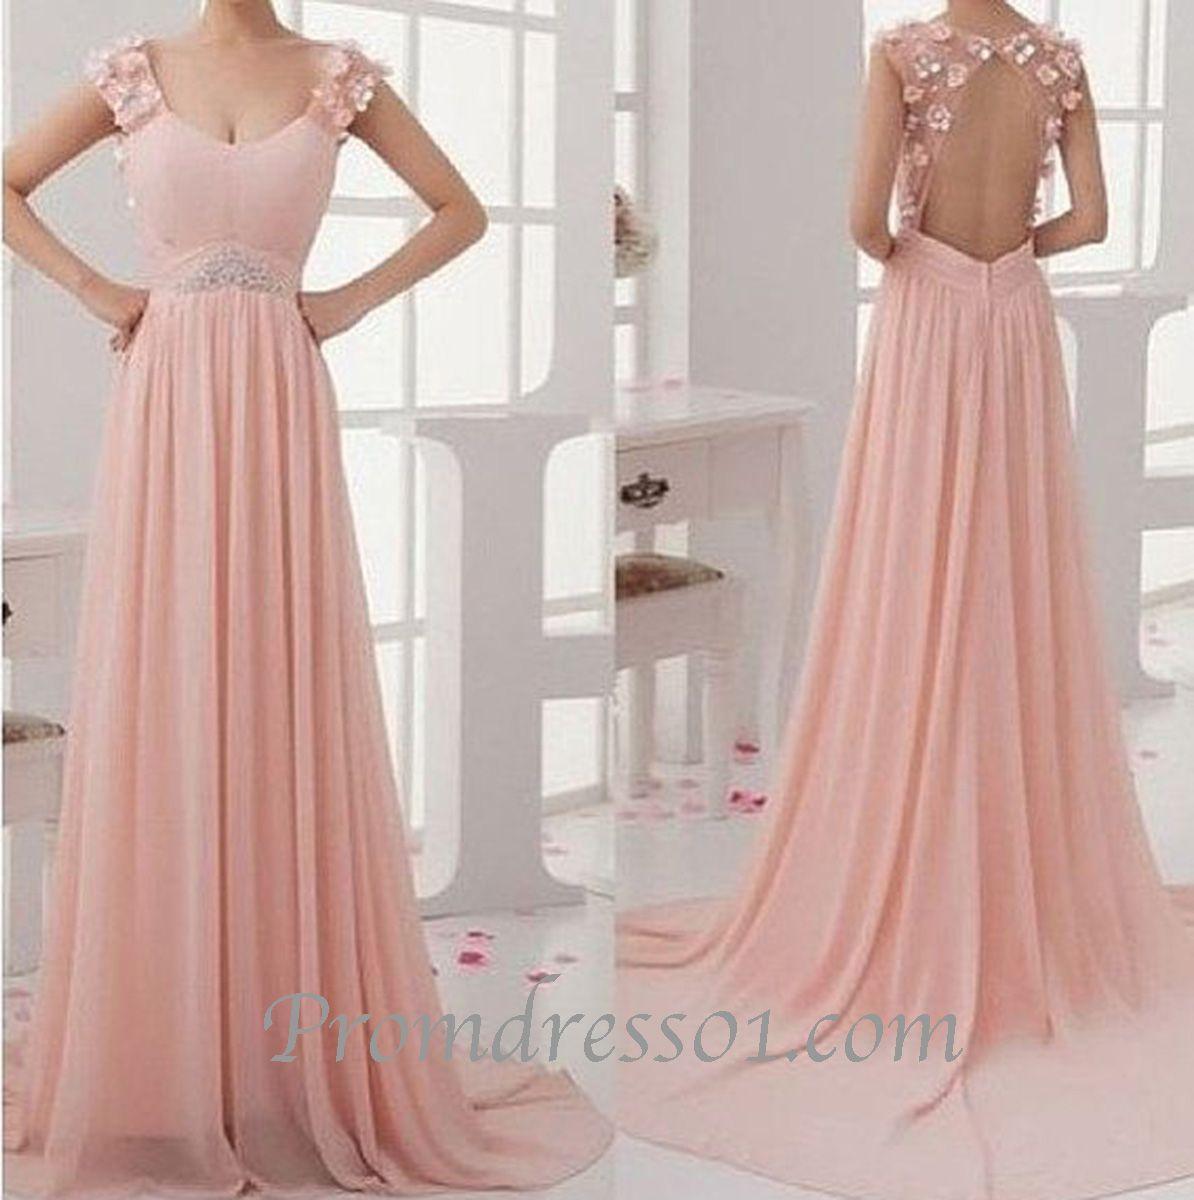 Prom dress 2016, prom dresses long   Grad Dresses   Pinterest ...